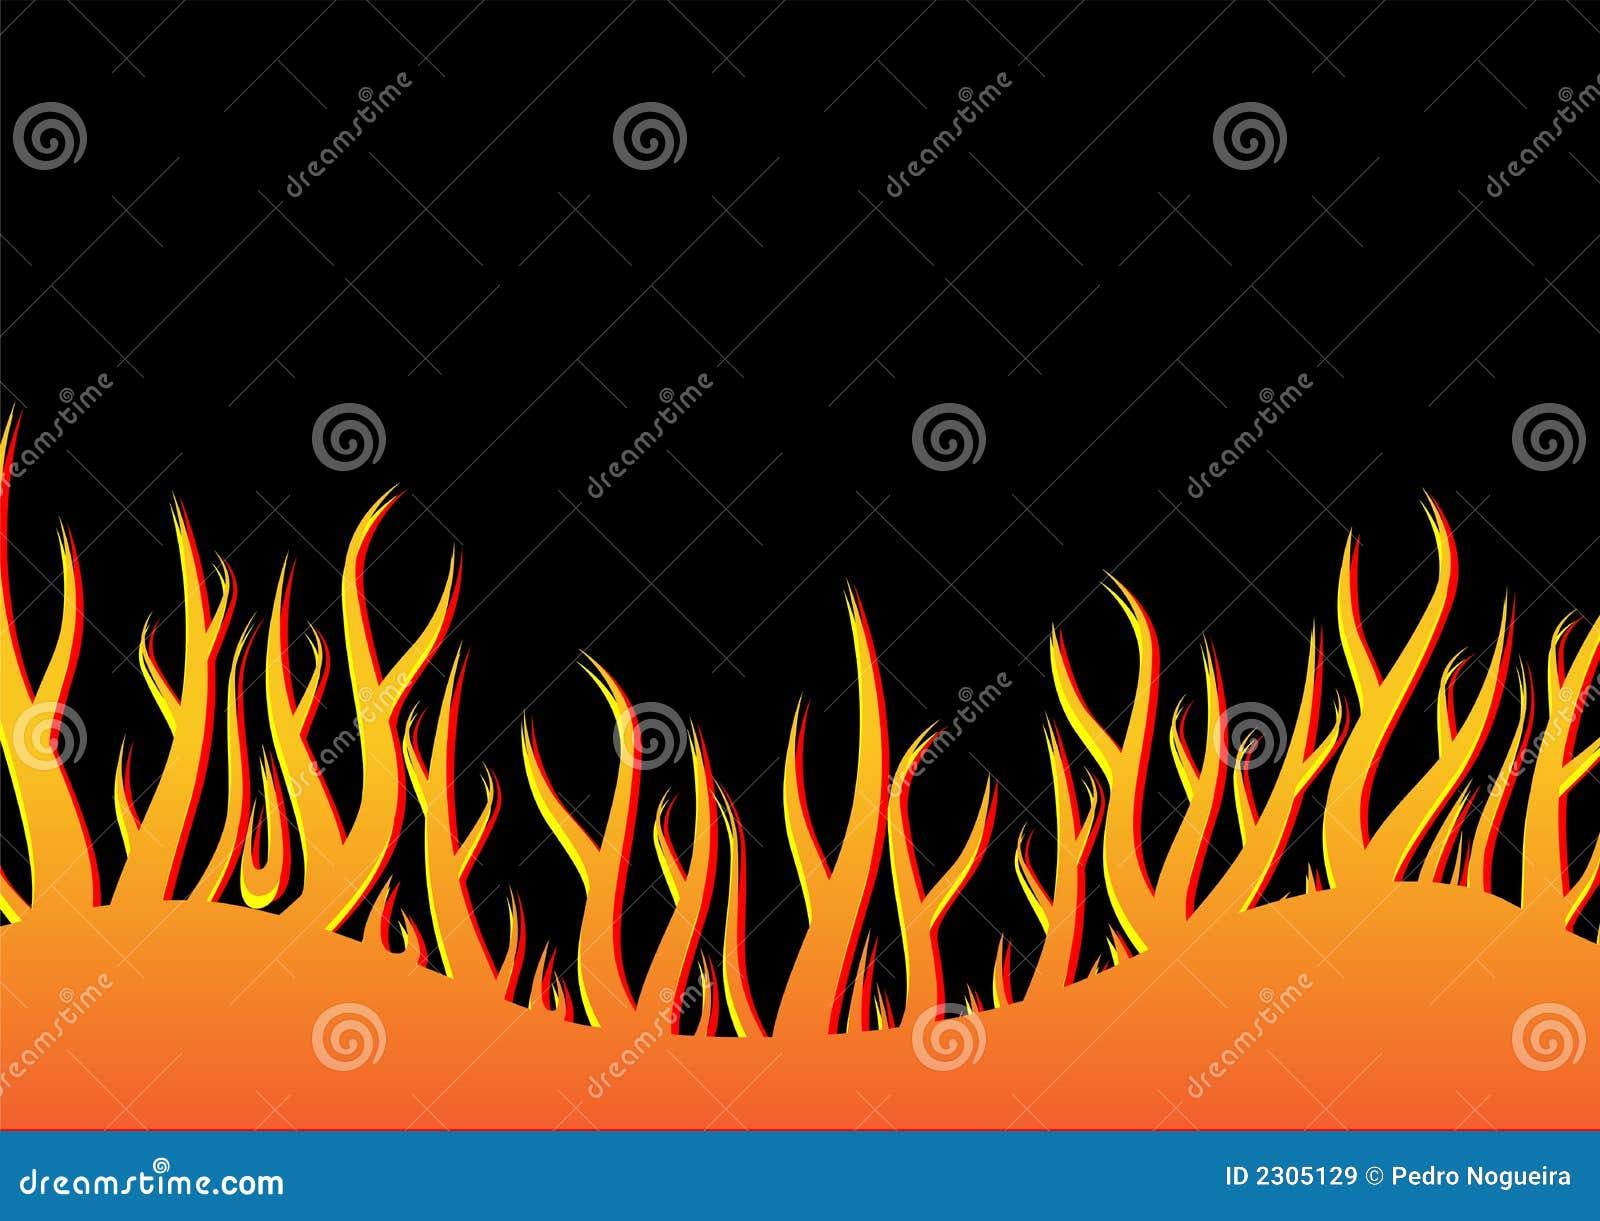 Flames_01